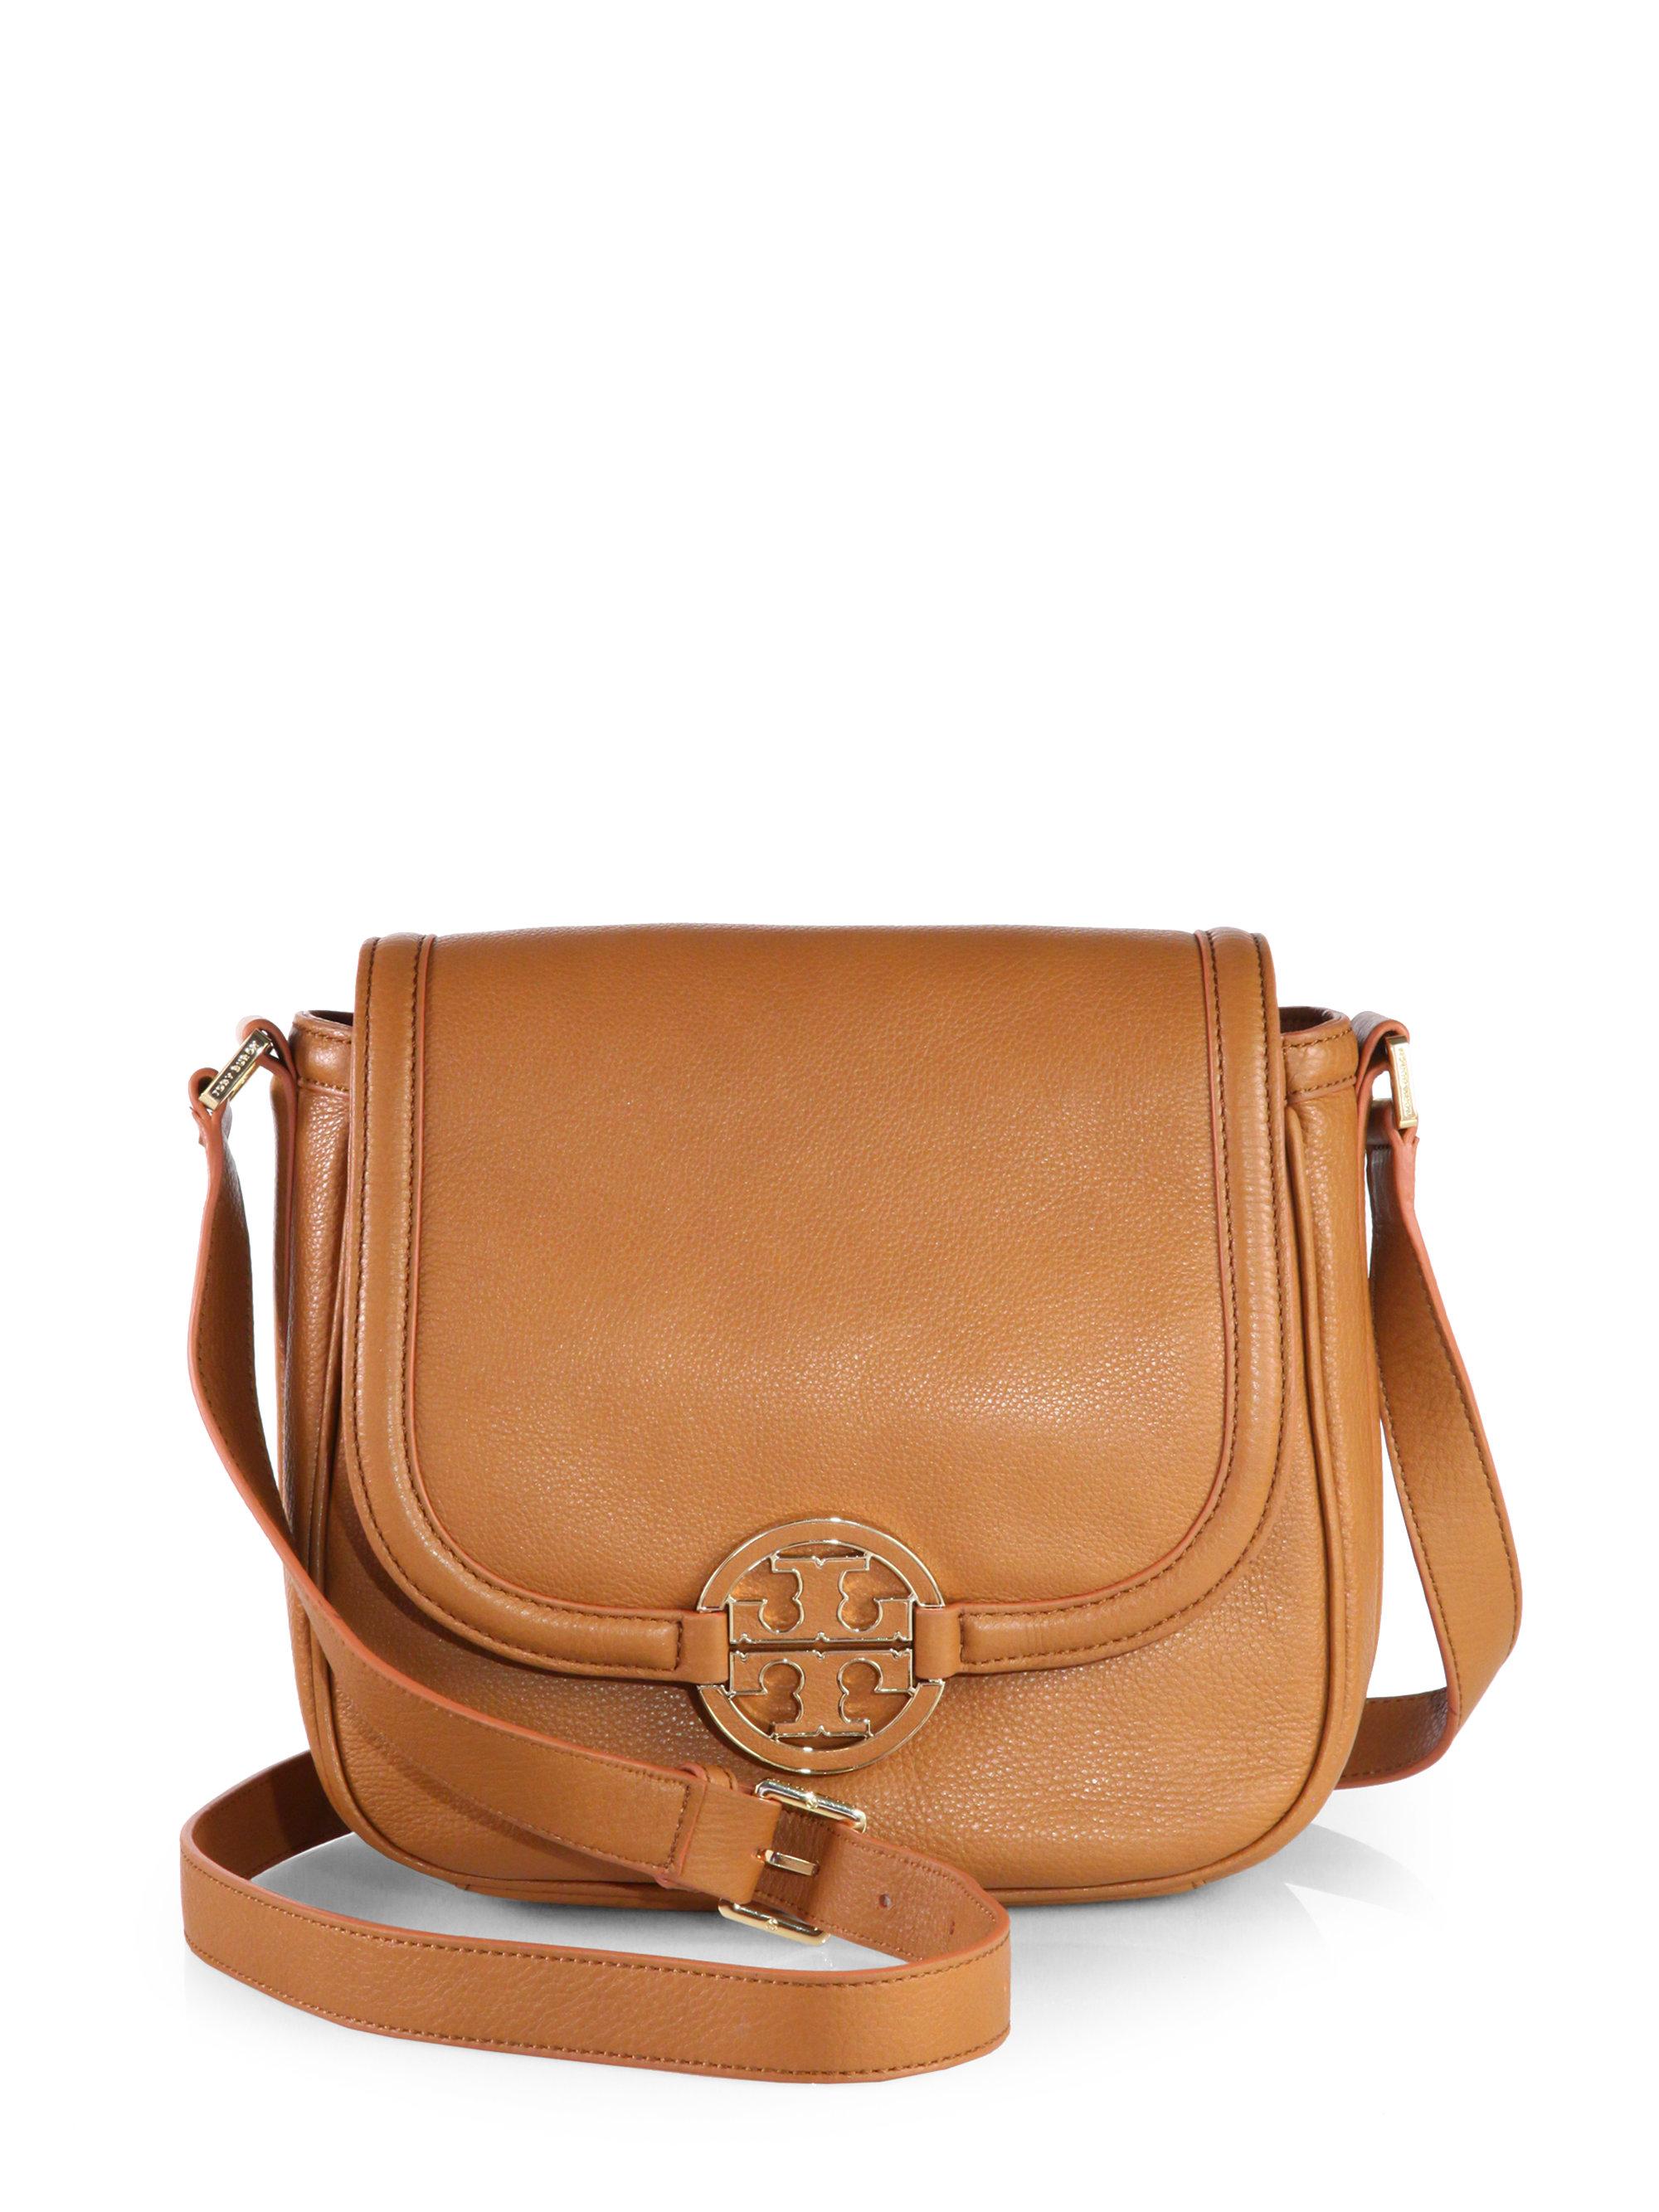 86b0e0d74ffd8 Lyst - Tory Burch Amanda Round Crossbody Bag in Brown